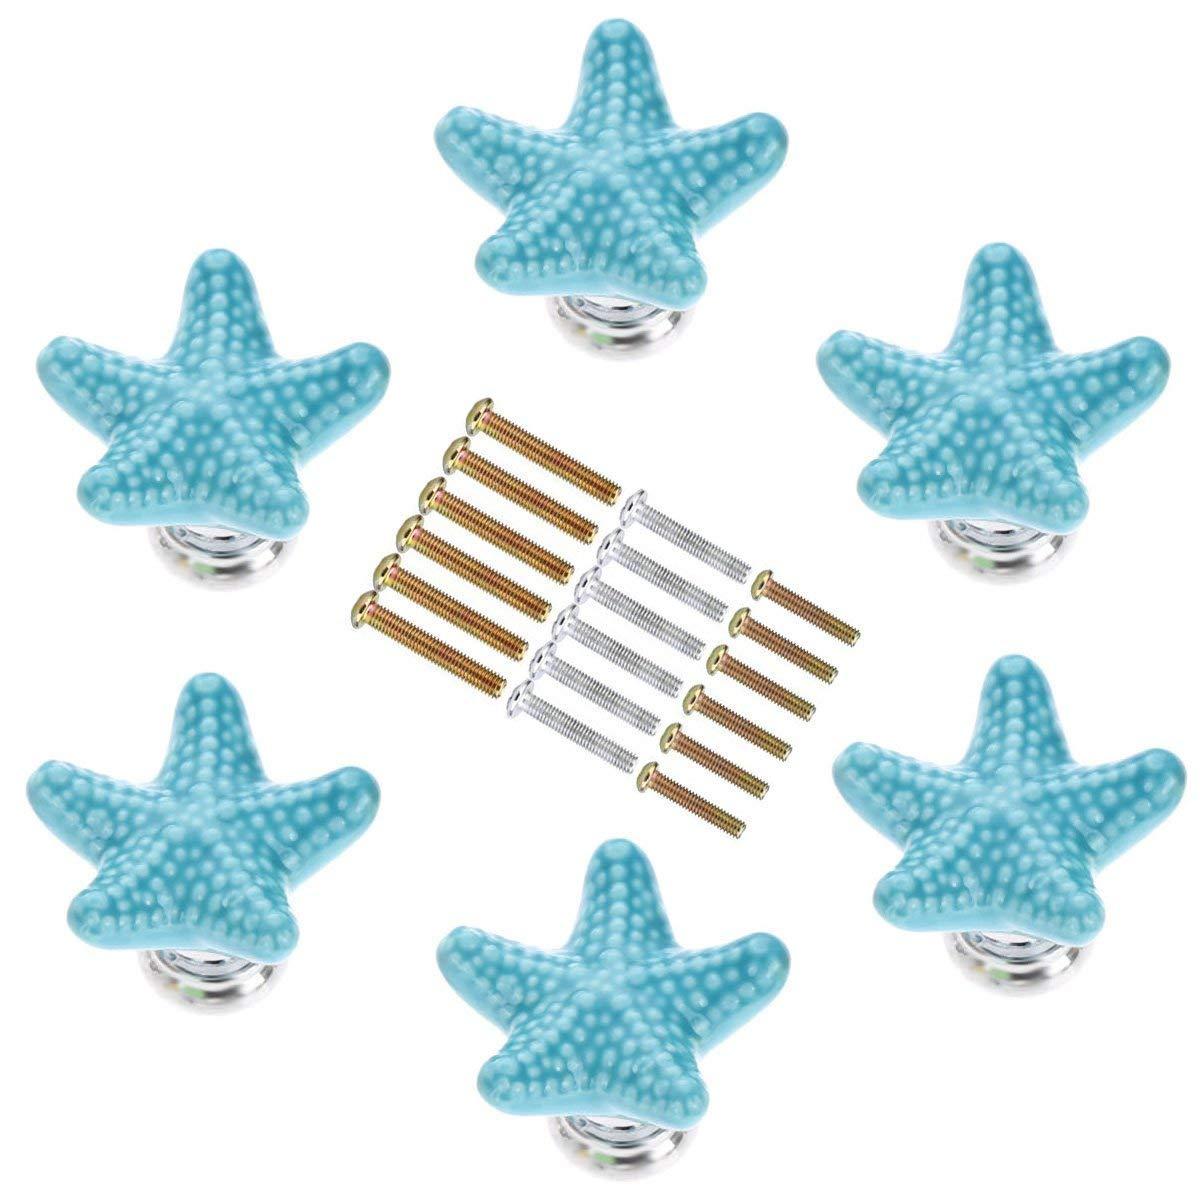 SCTD Starfish Ceramic Drawer Pulls Handles for Nursery Dresser Cupboard Wardrobe Cabinet Kitchen, Beach/Ocean Theme Knobs, Pack of 6 (Blue)